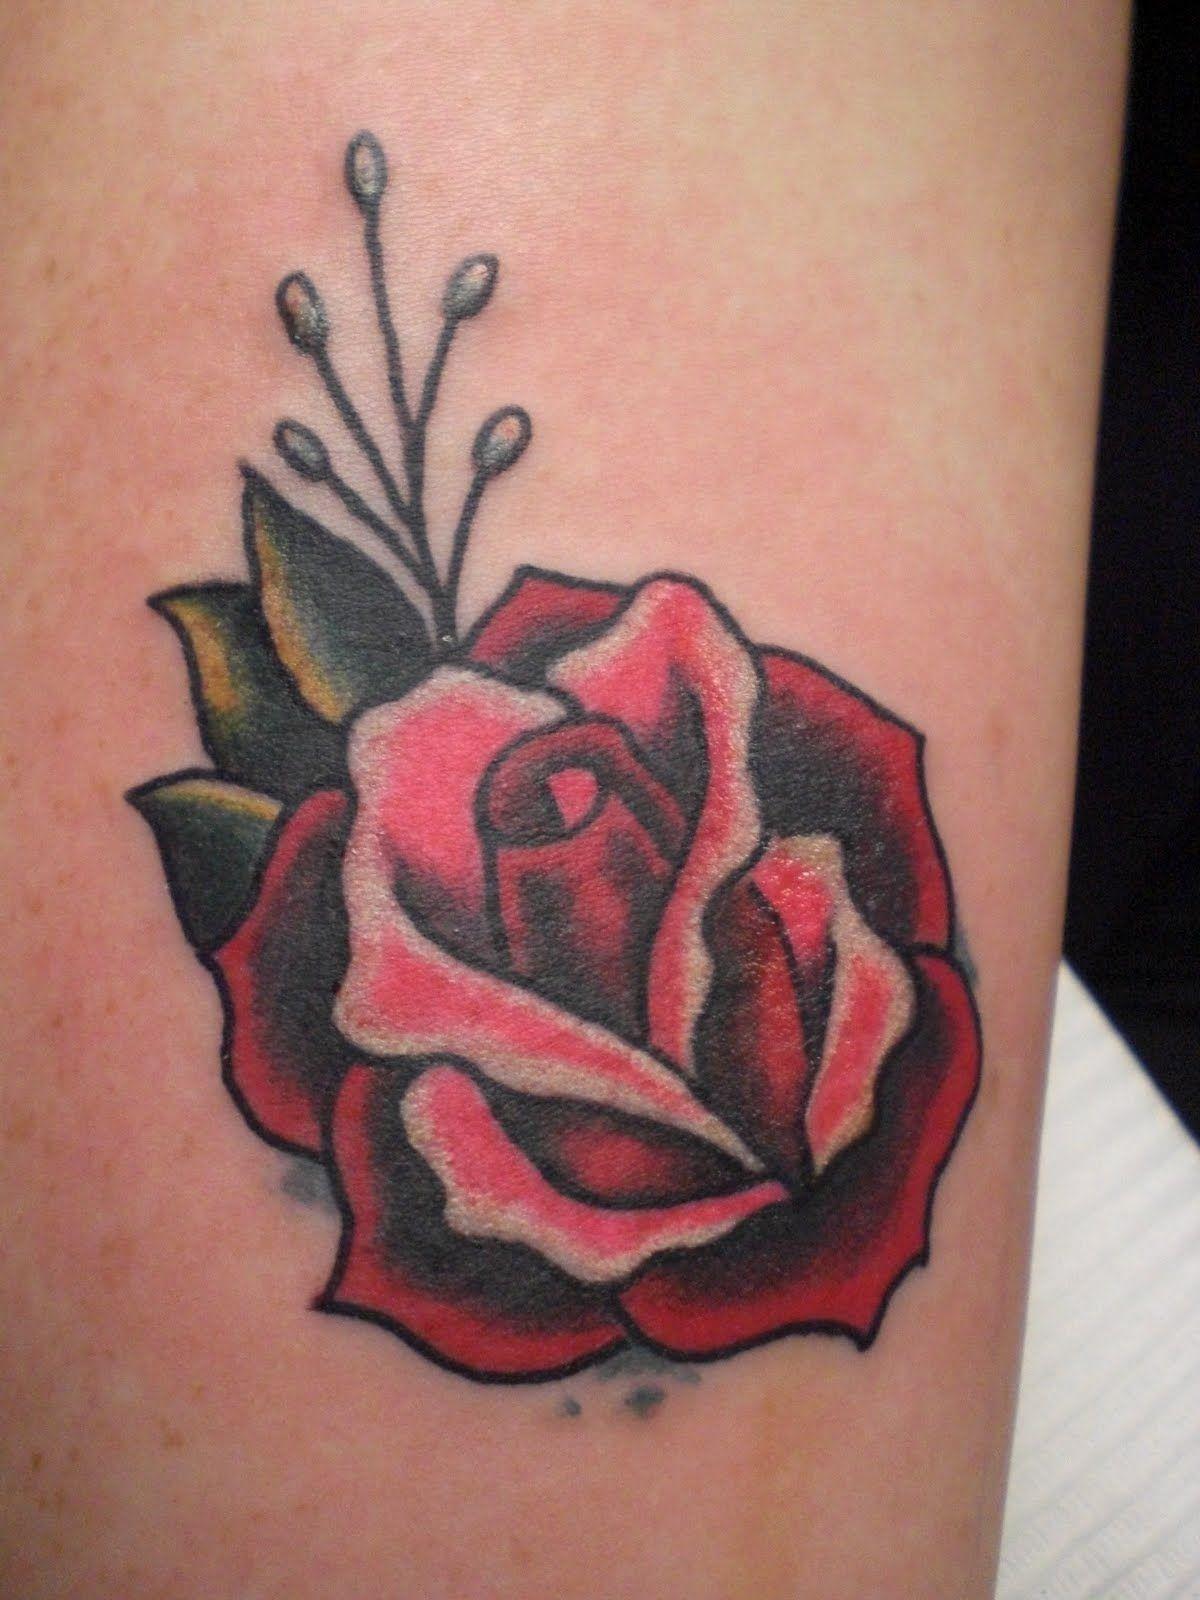 Pin Van Gina Meehan Op Art Pinterest Rose Tattoos Tattoos En